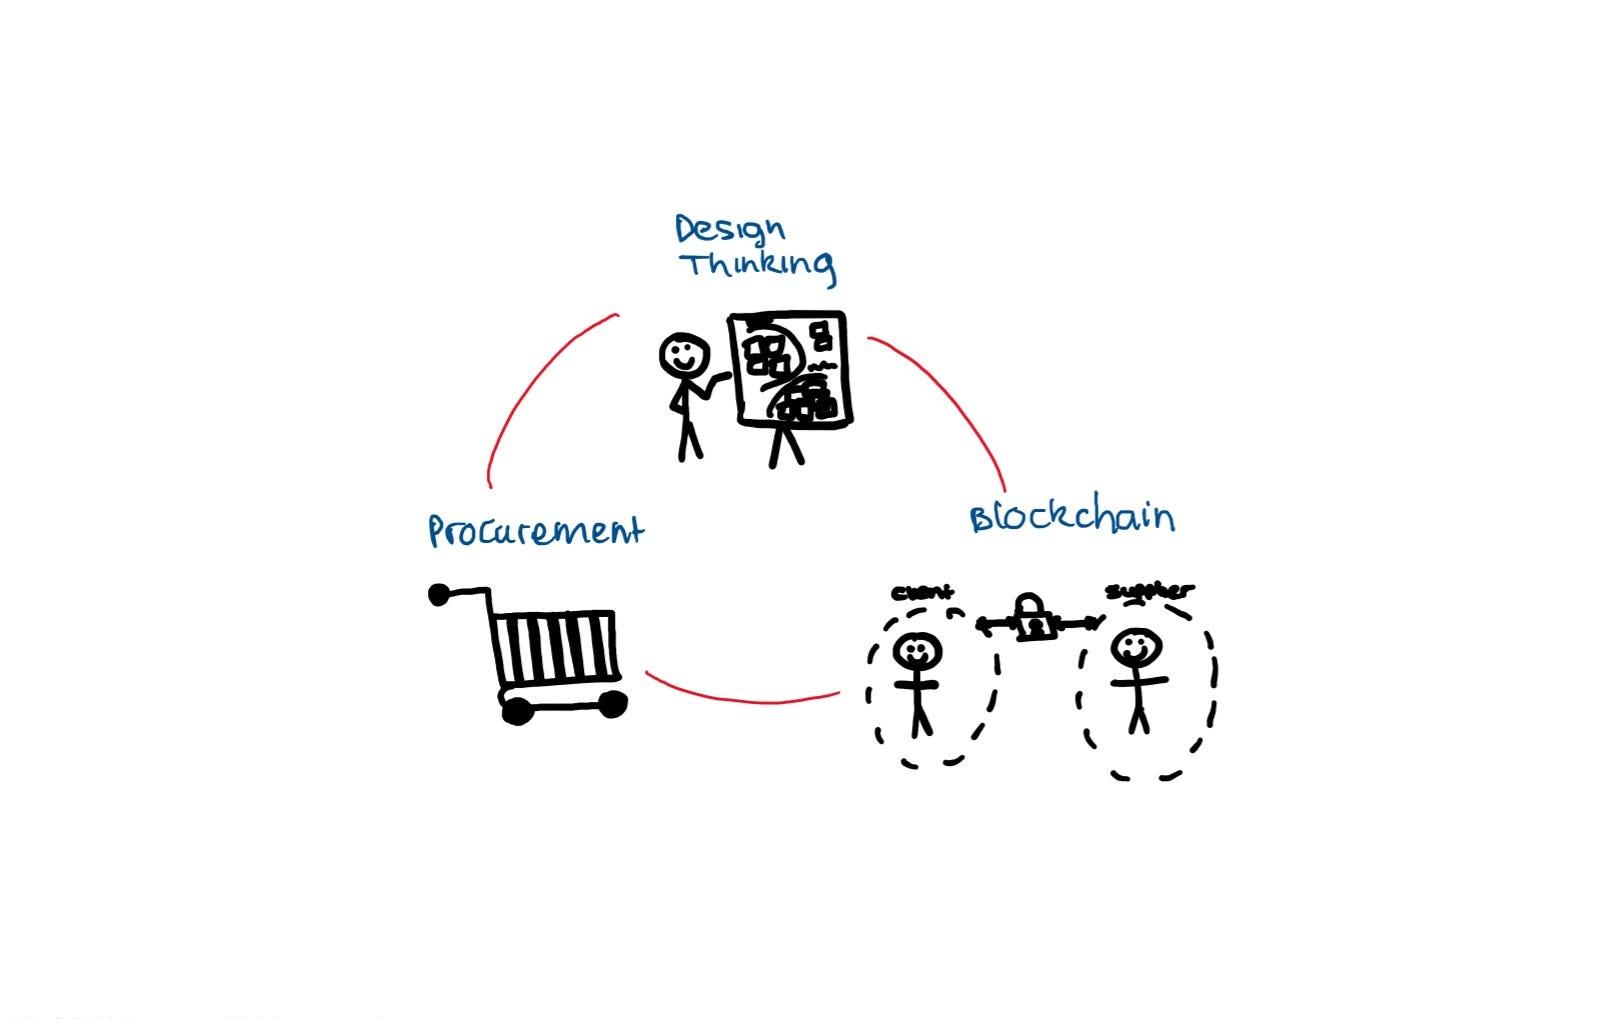 Design Thinking To Explore Blockchain In Procurement